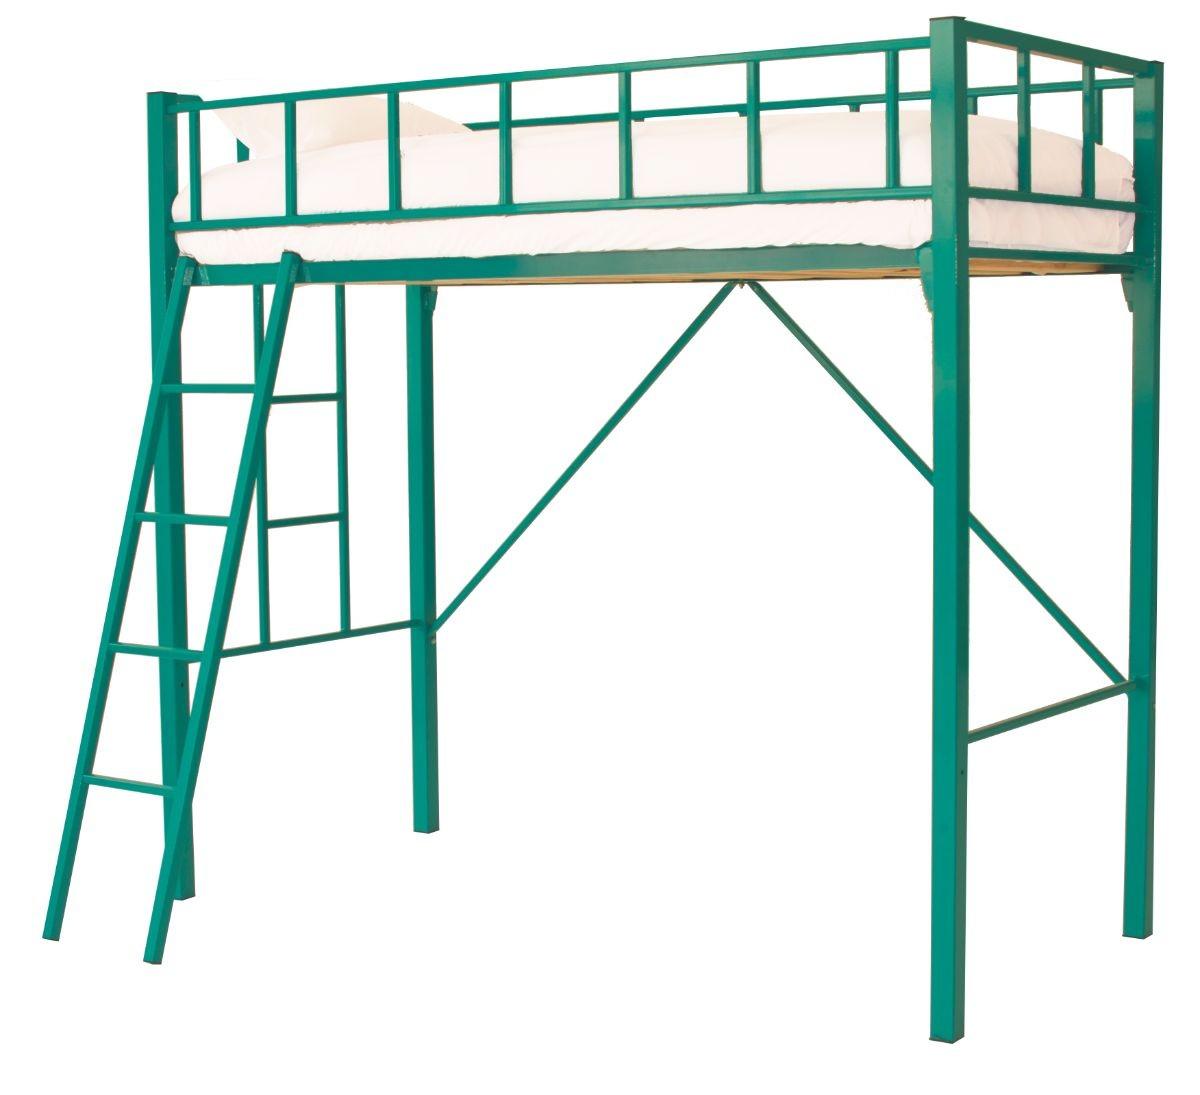 The Royal Loft Bunk Bed